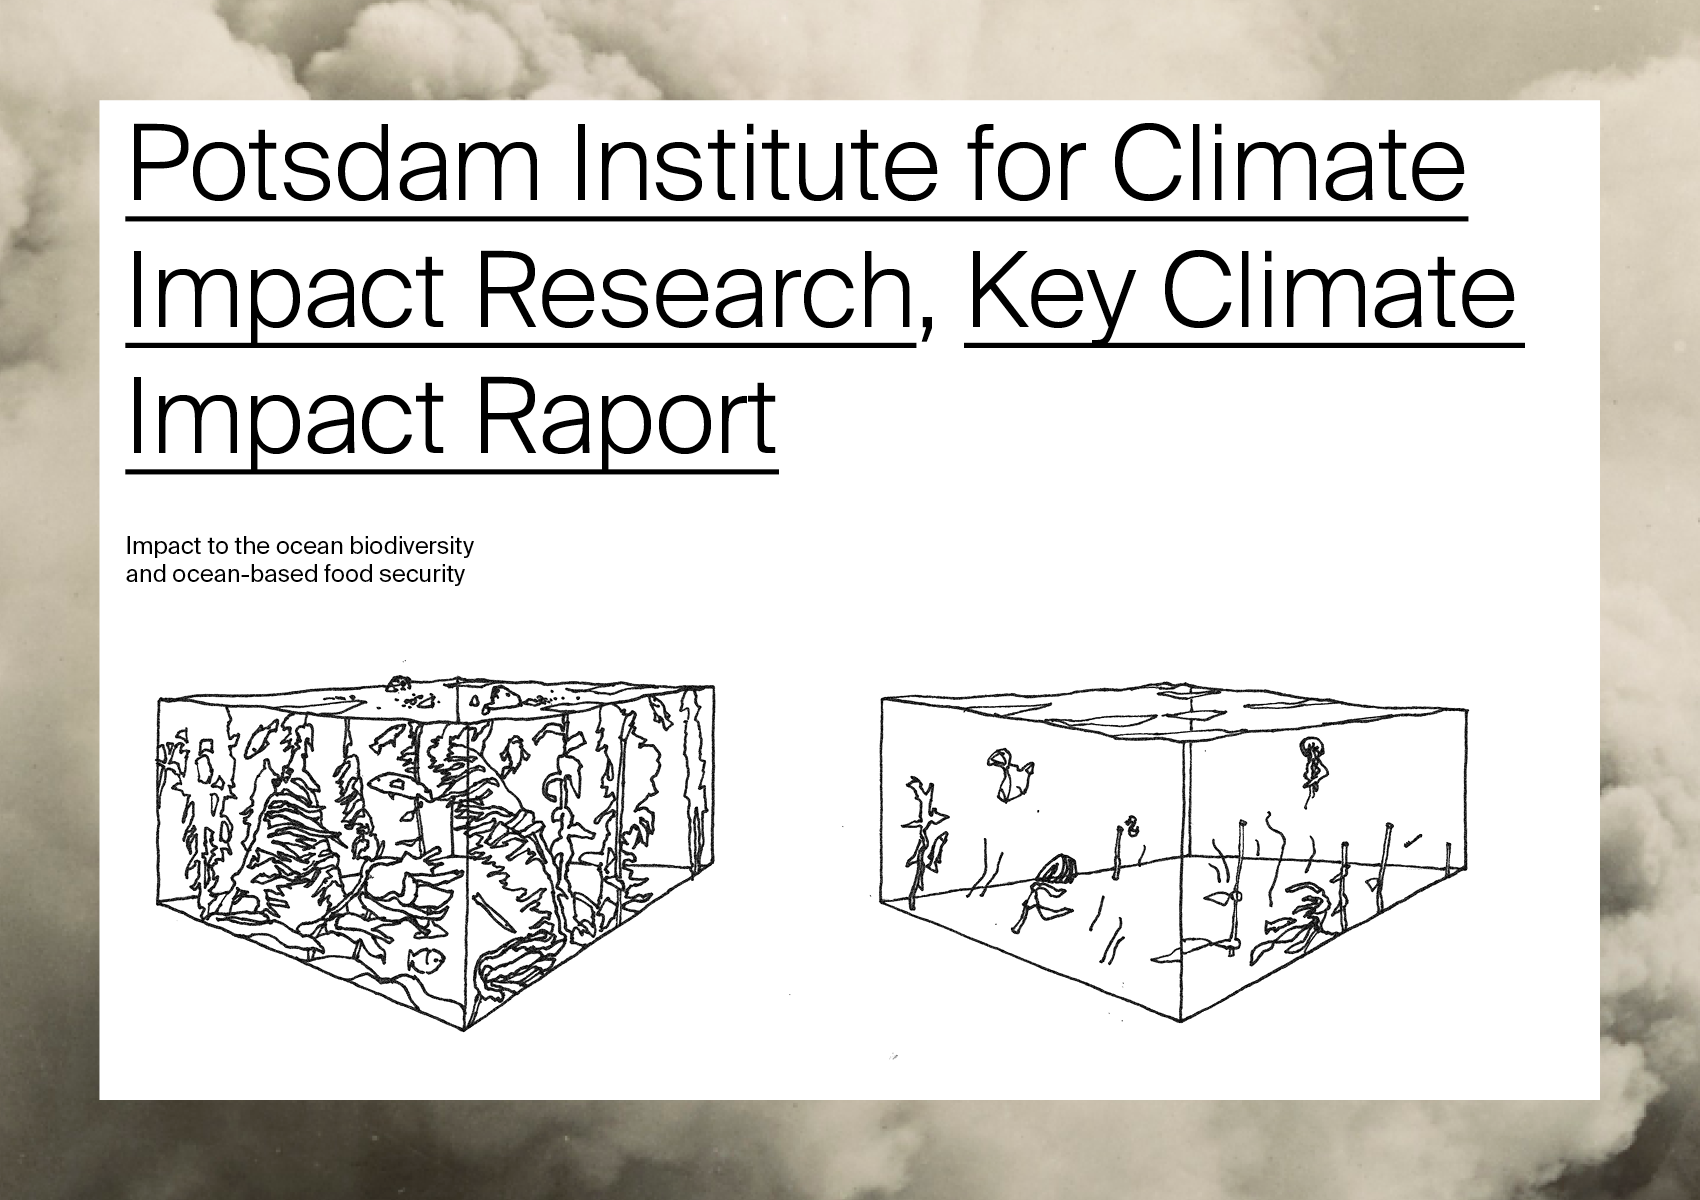 Climate Impact Raport